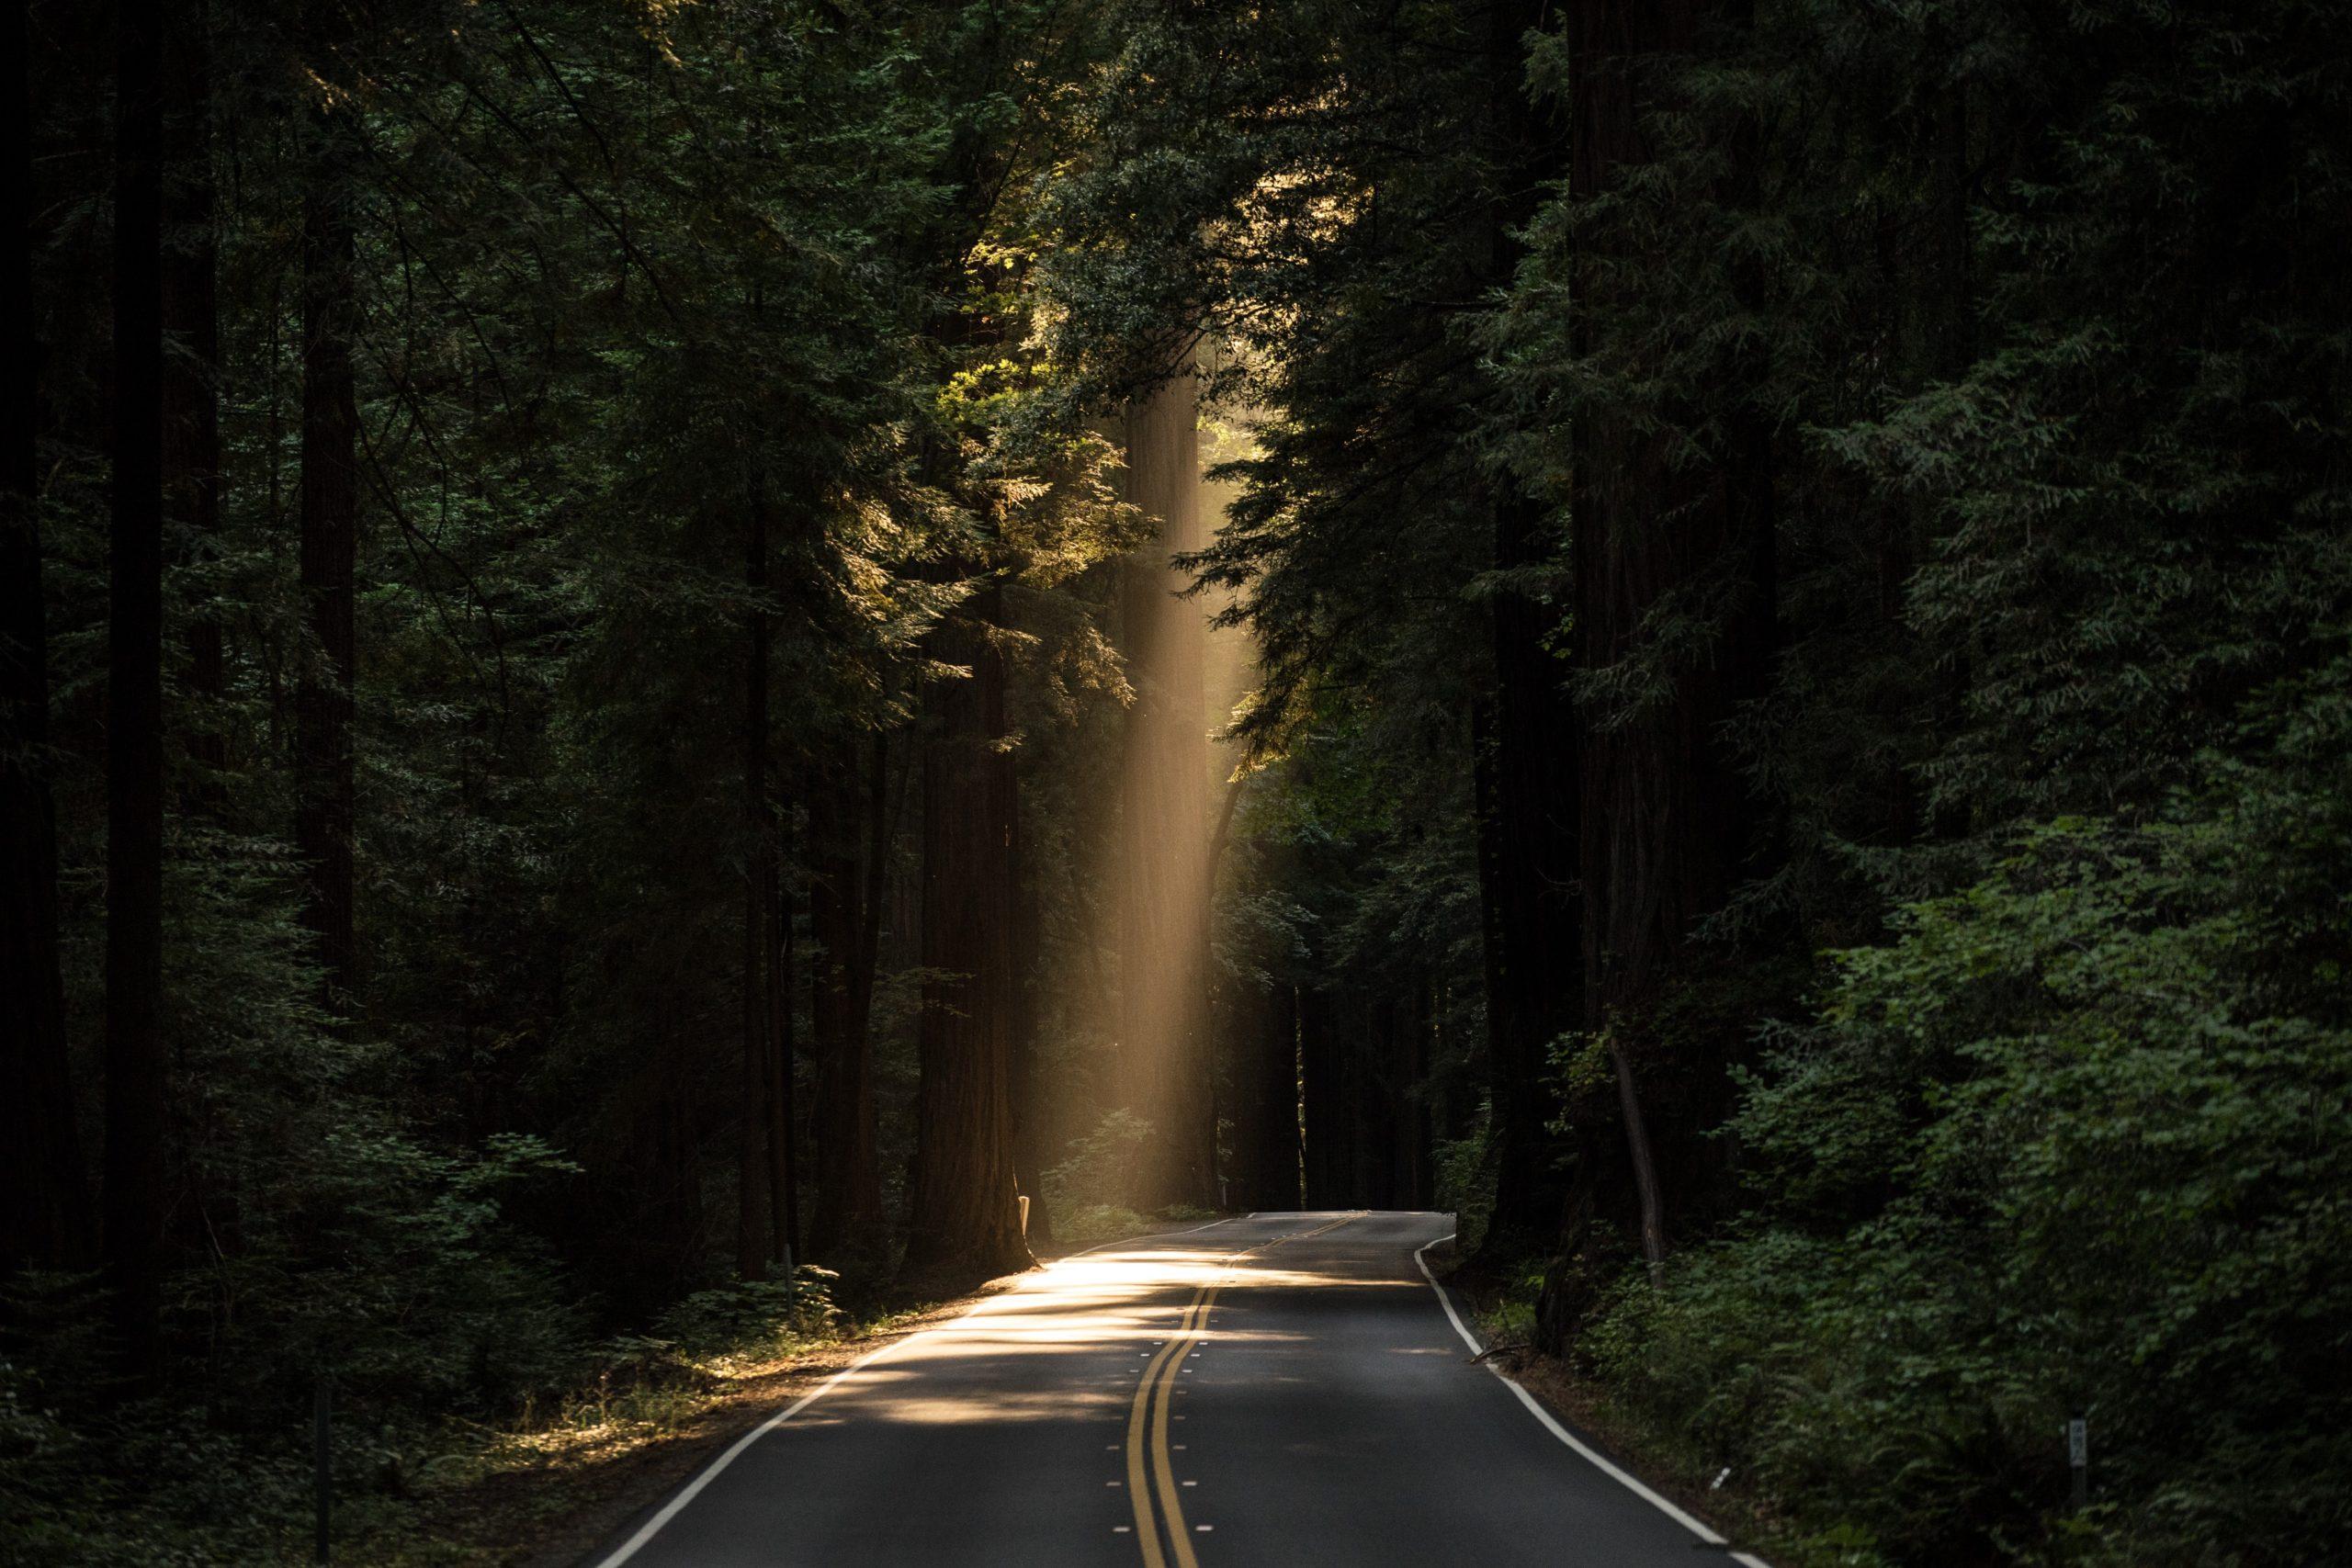 sunlight peaking through trees featured image